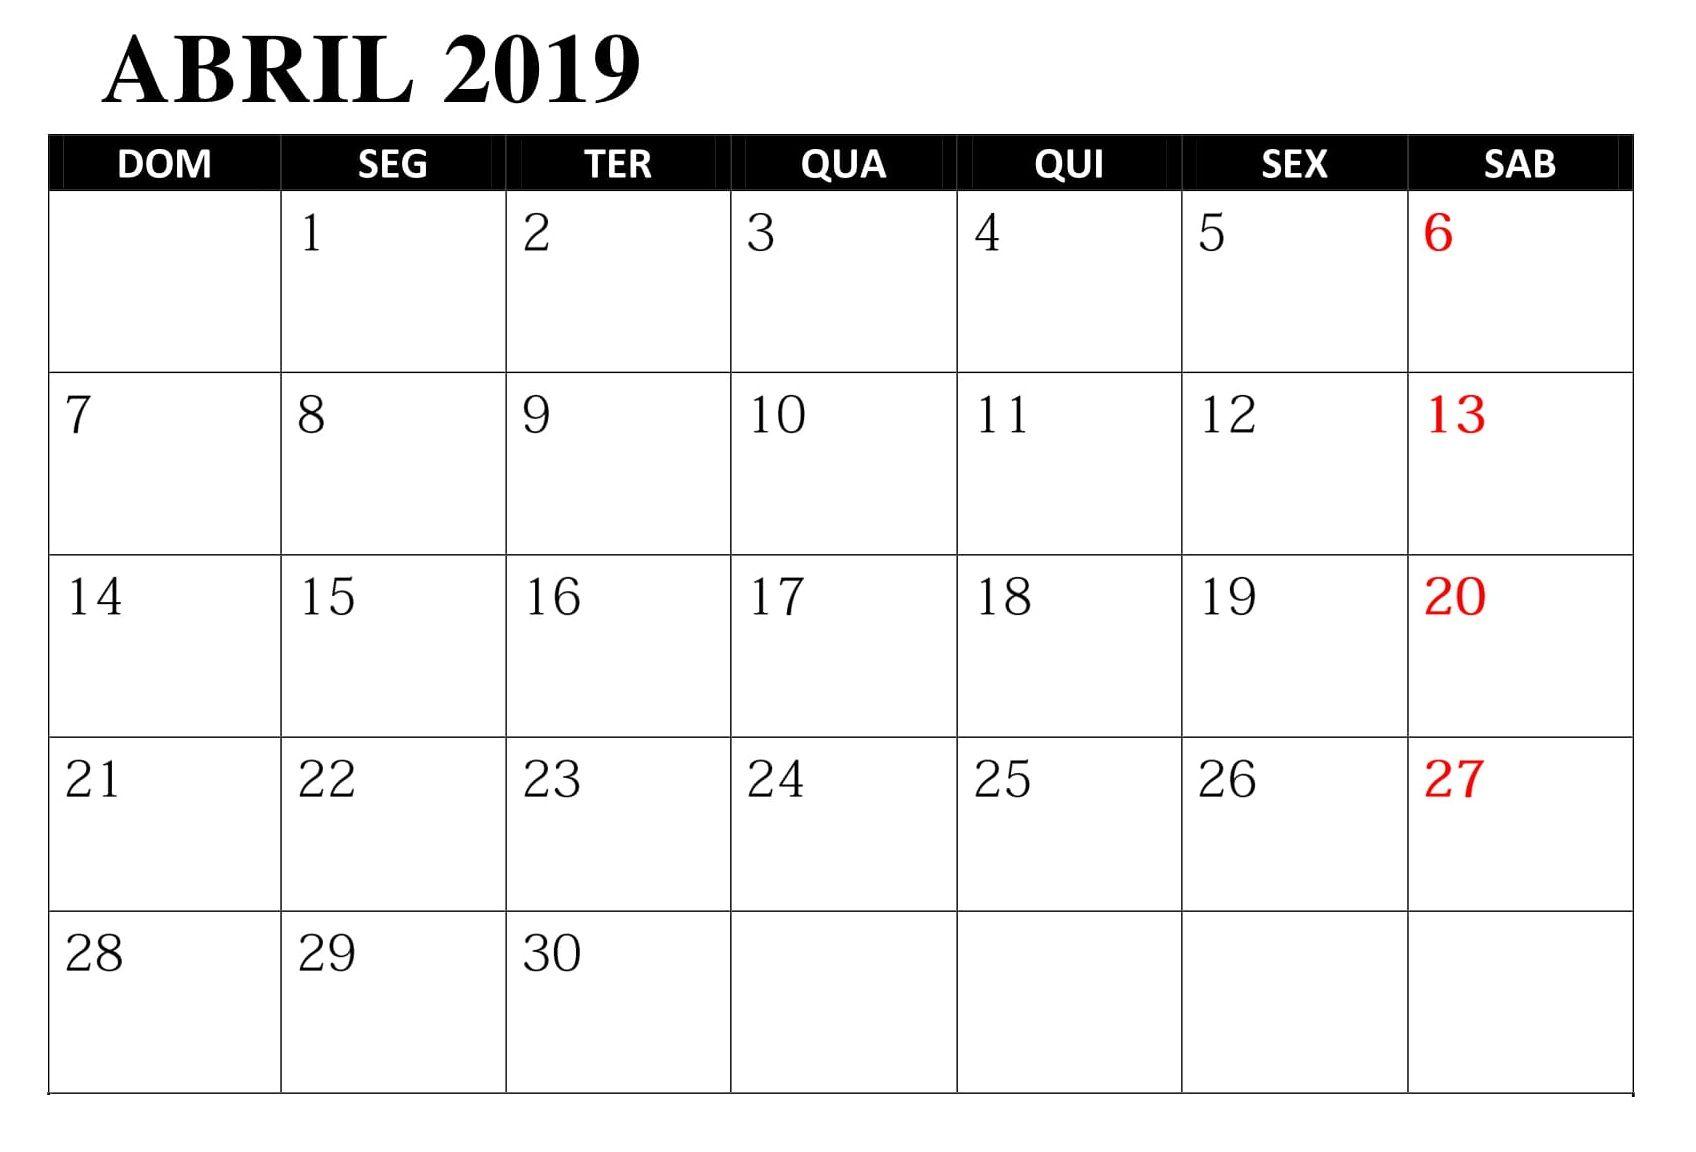 Calendario Imprimir Abril 2019.Calendario Abril 2019 Imprimir Calendario Abril 2019 Imprimir